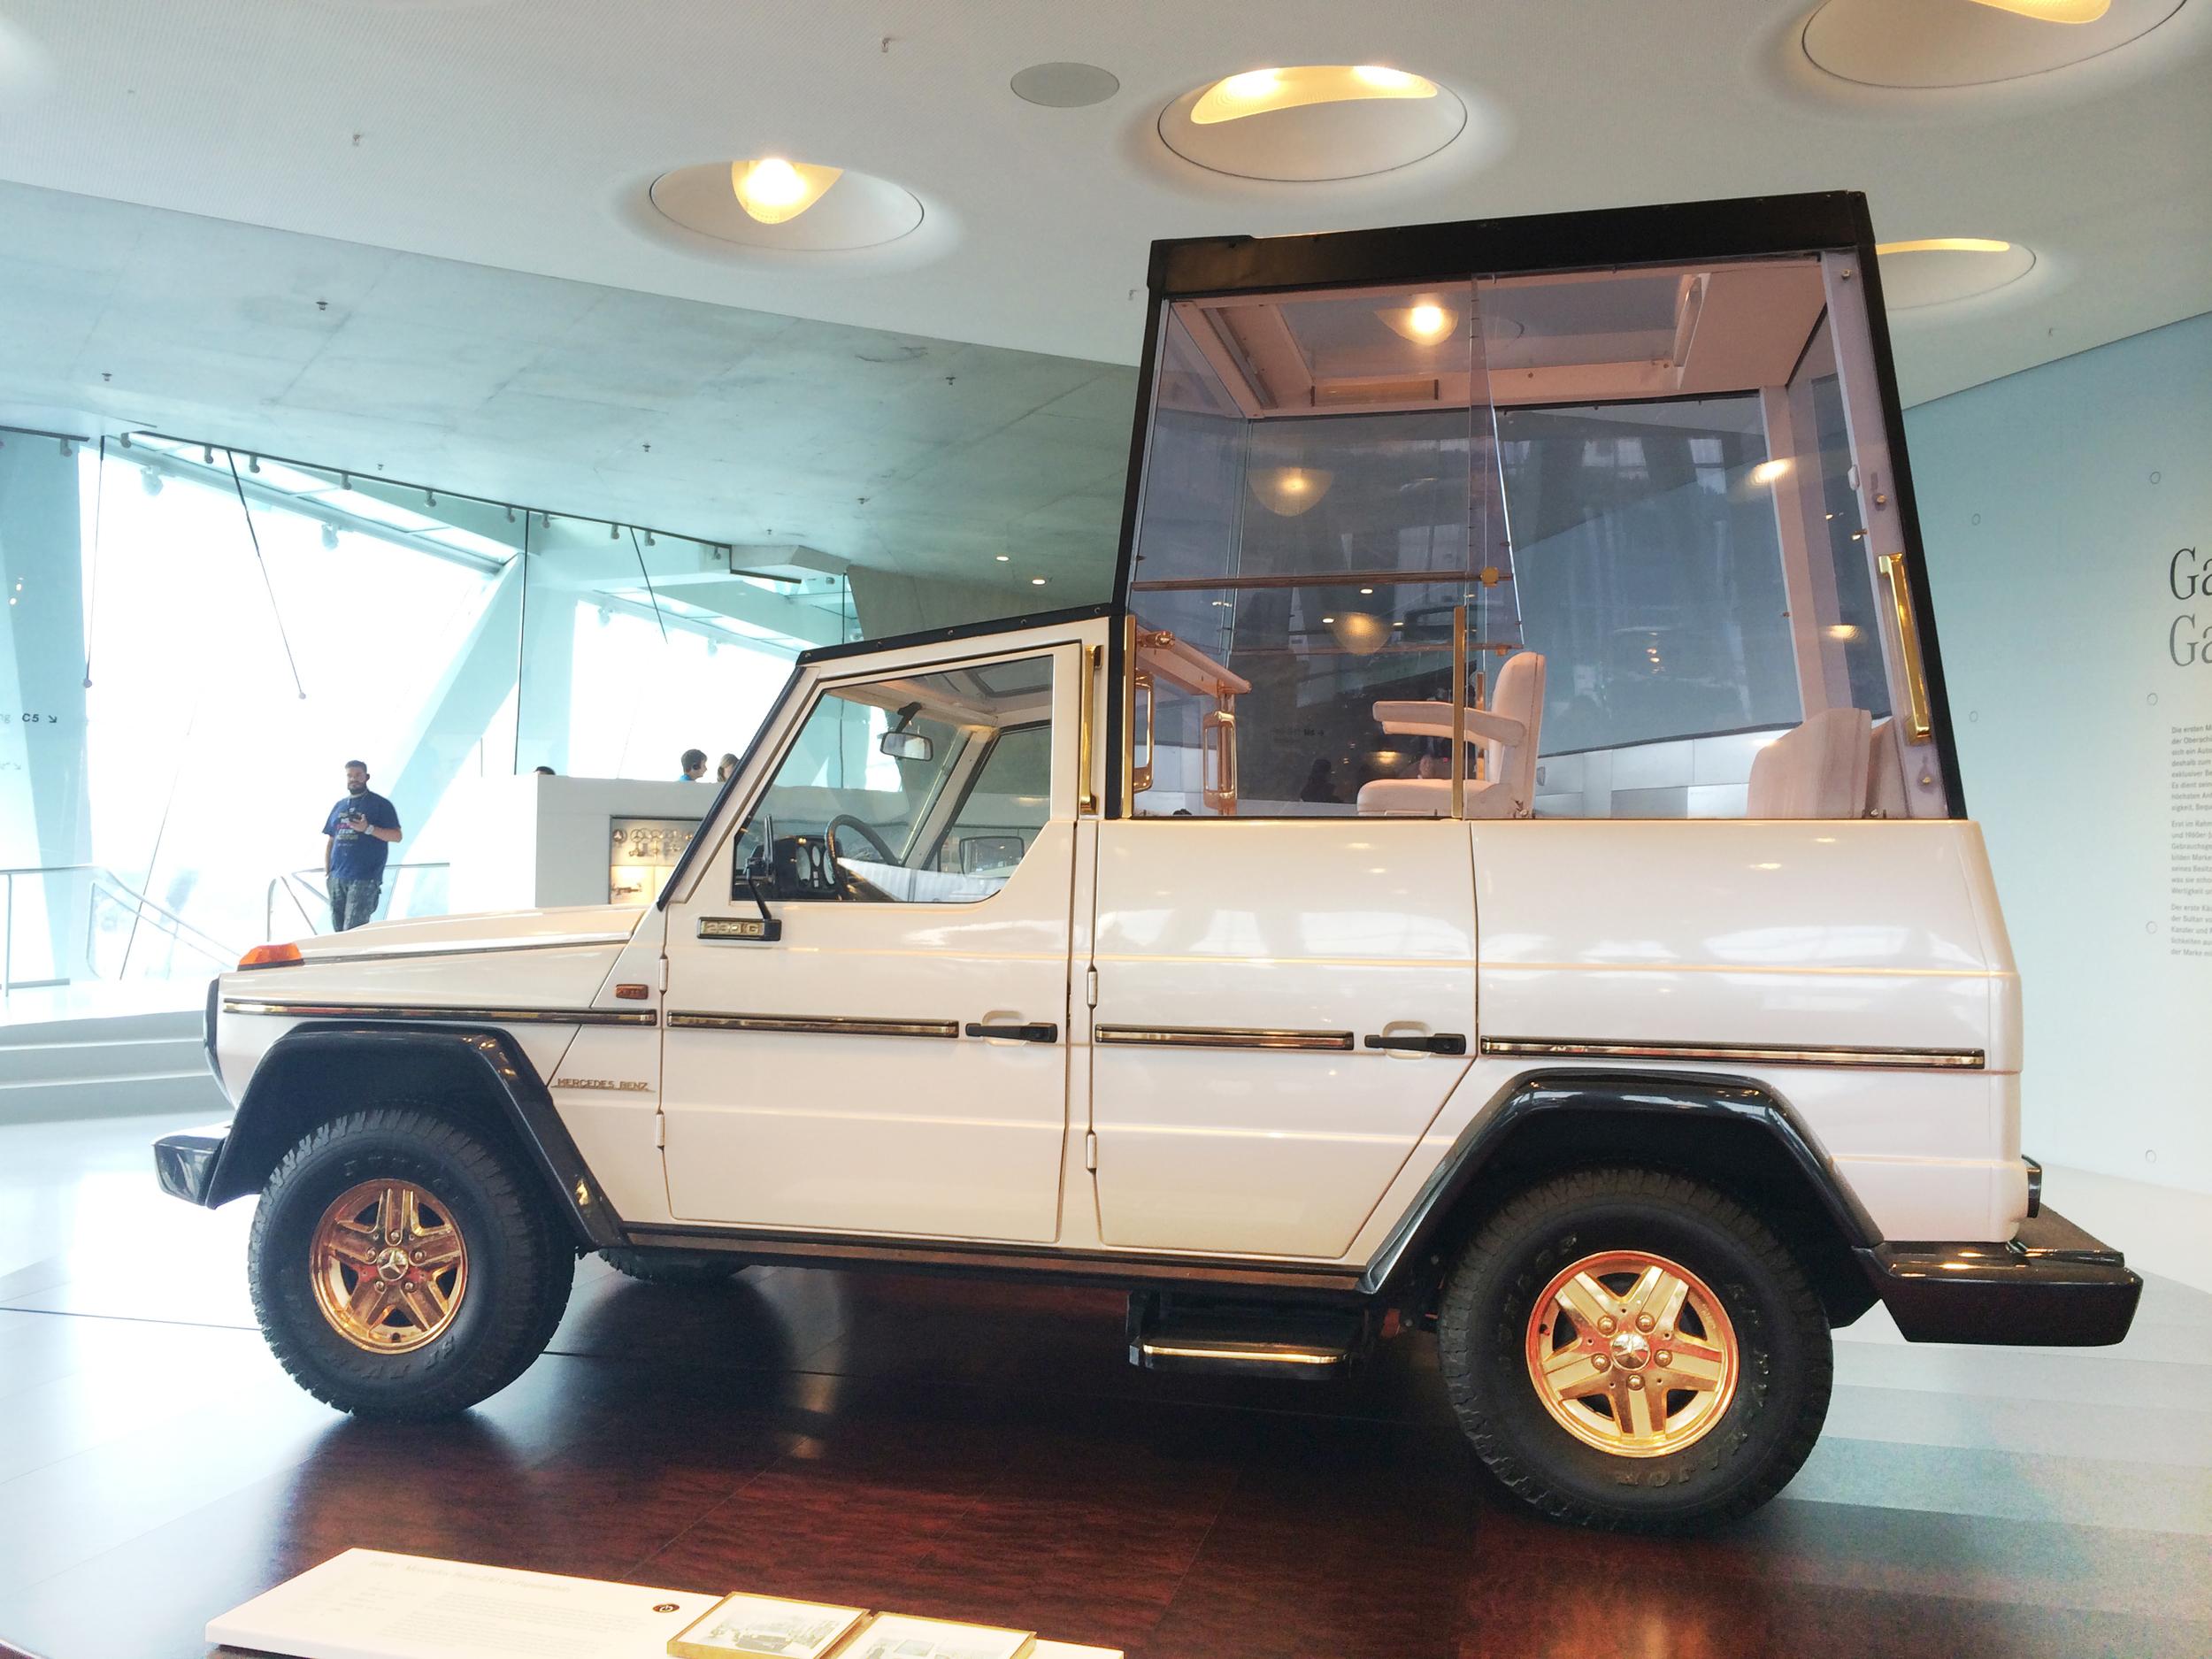 The Popemobile!